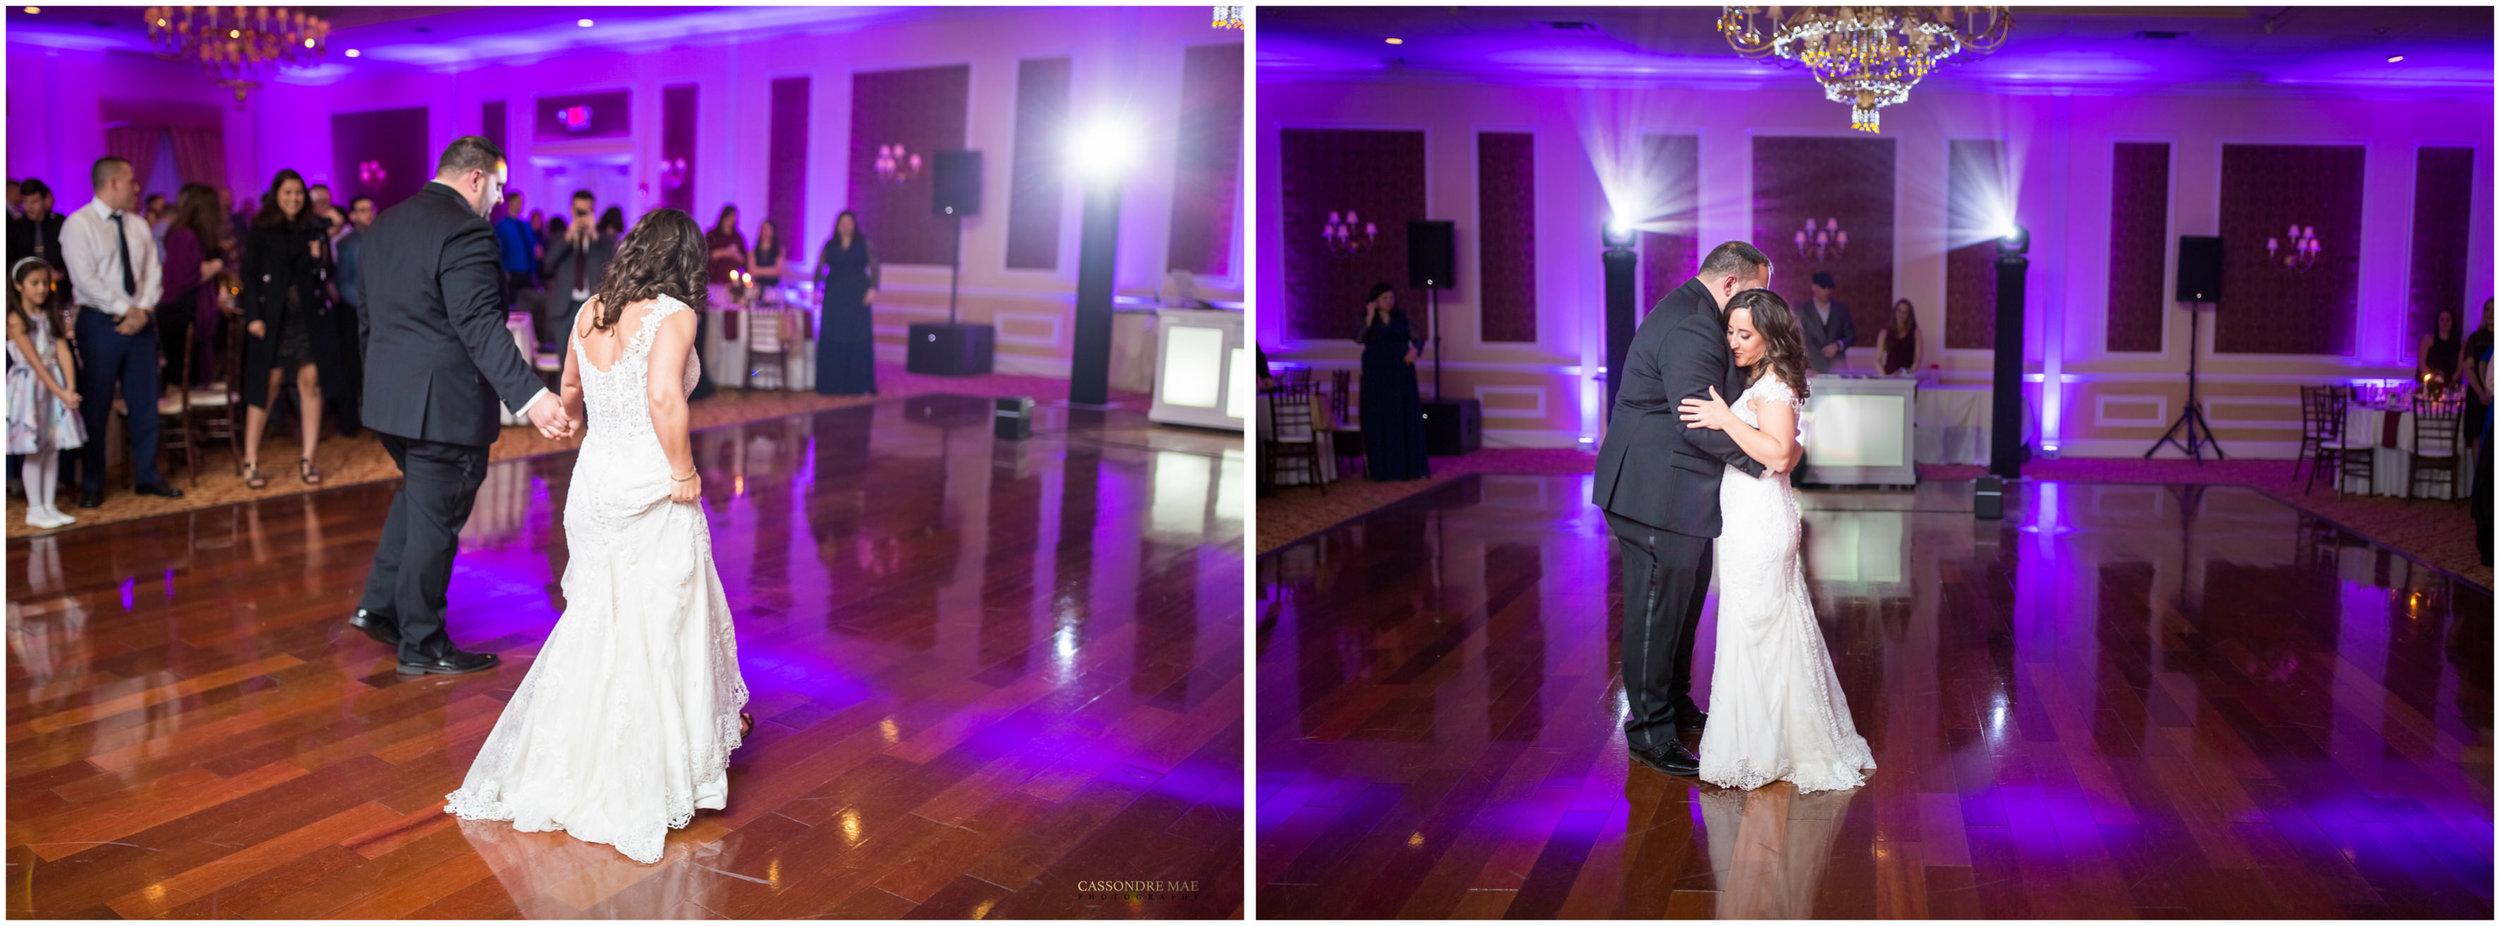 Cassondre Mae Photography The Grandview Weddings 26.jpg